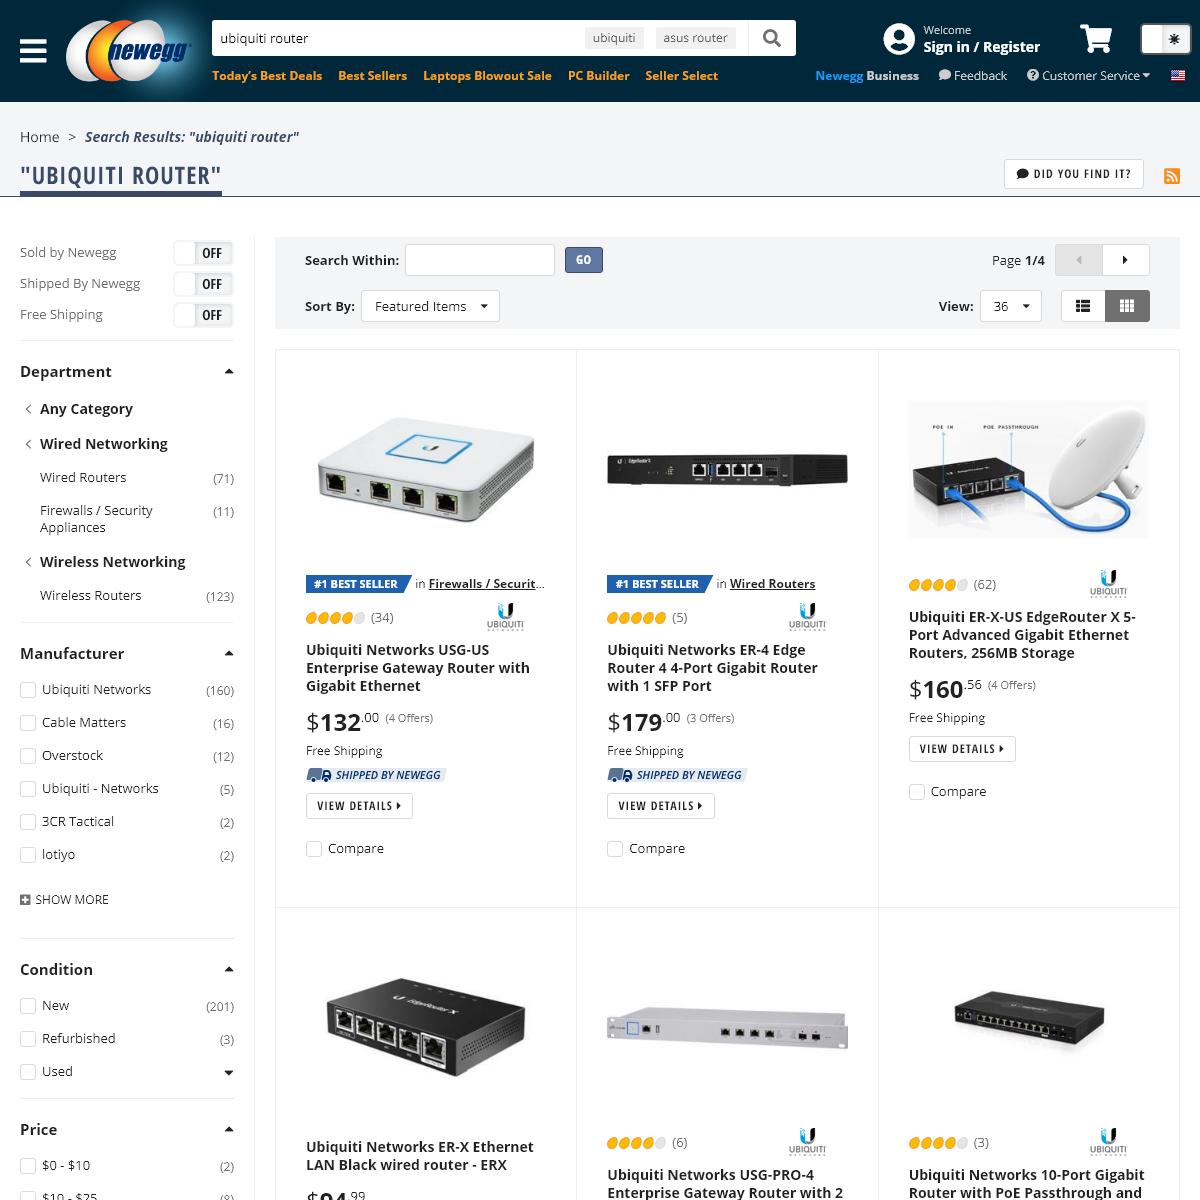 ubiquiti router - Newegg.com